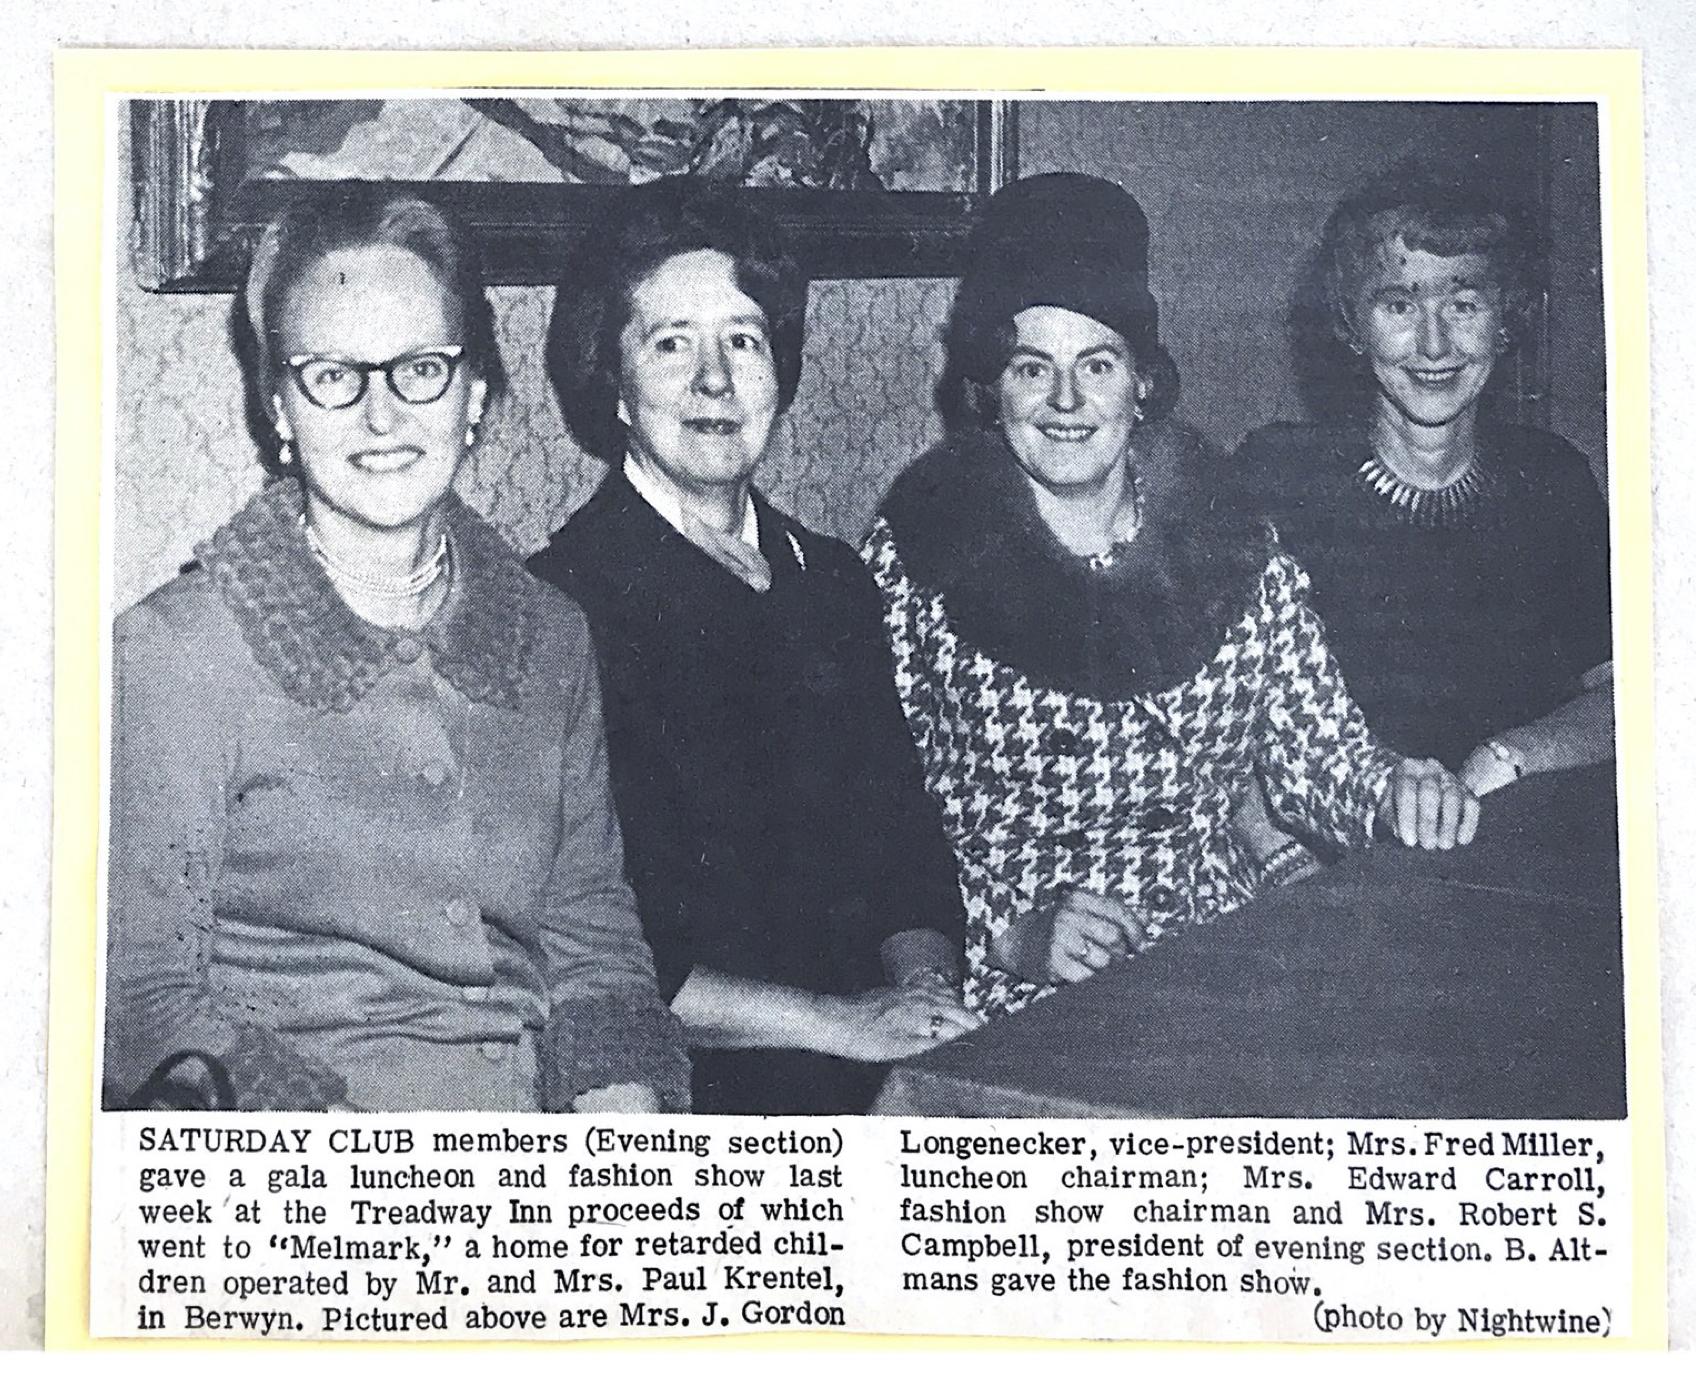 The Saturday Club 1967.2